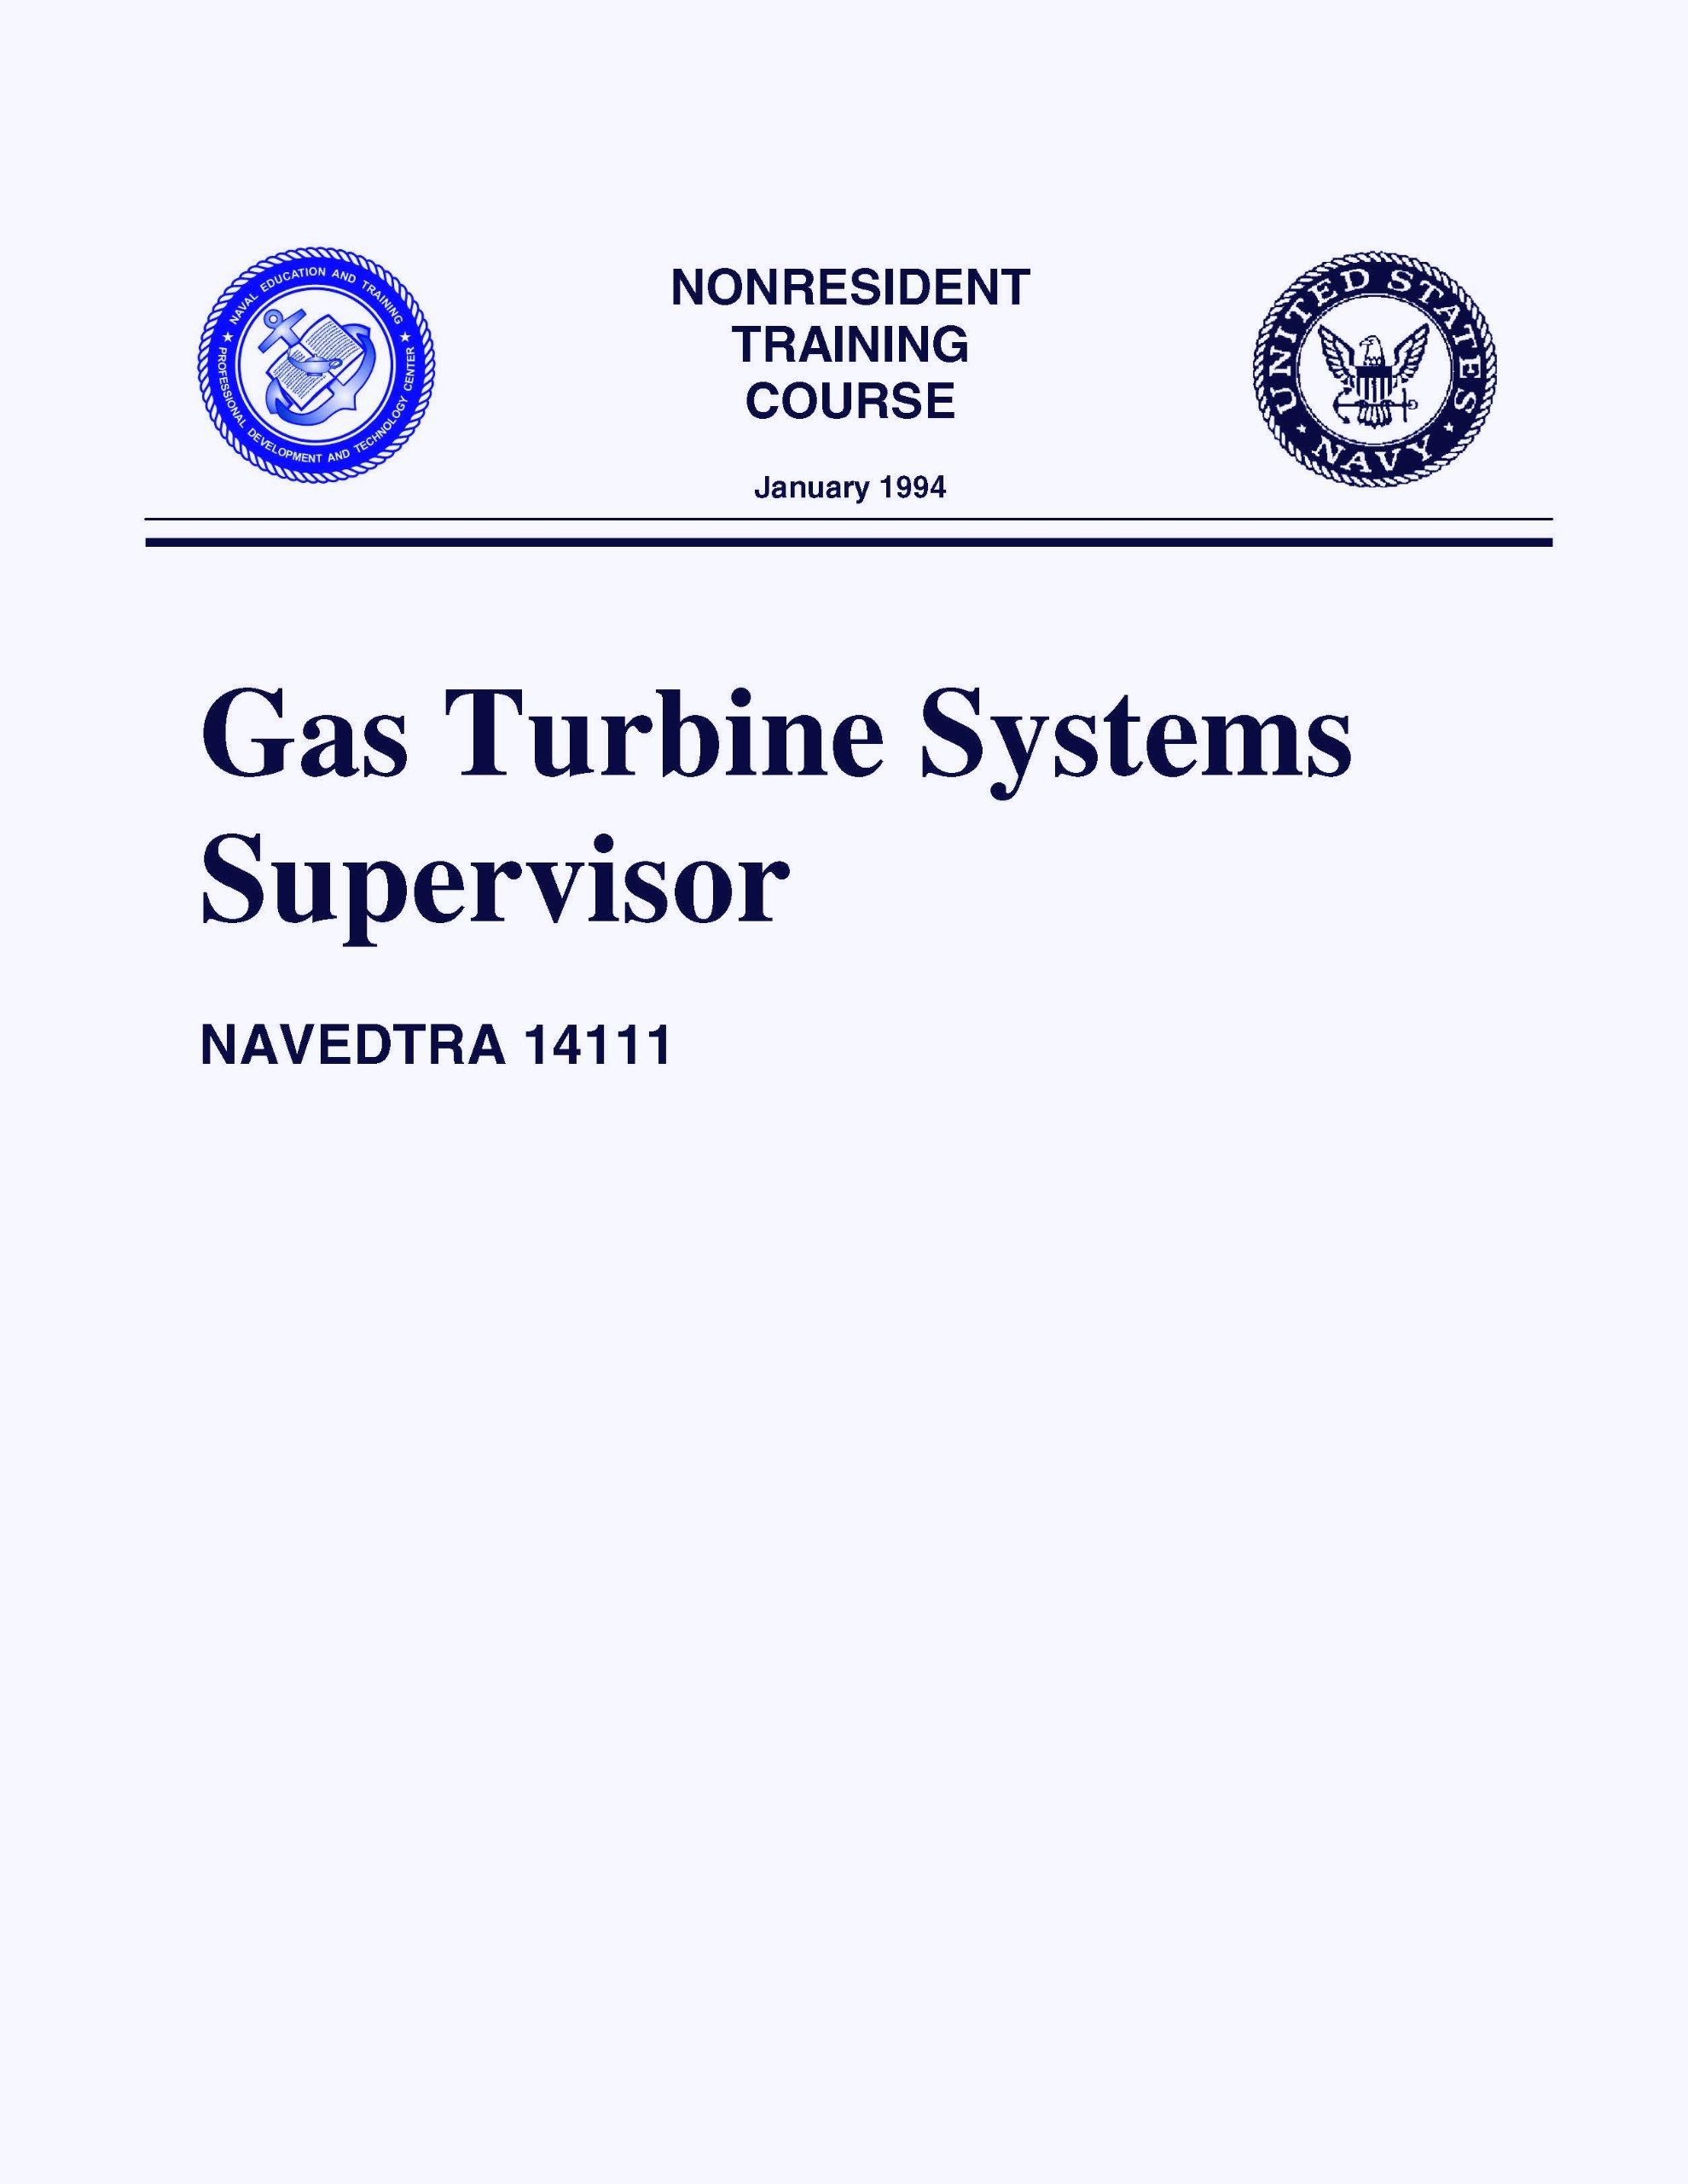 NAVEDTRA Gas Turbine Systems Supervisor NONRESIDENT